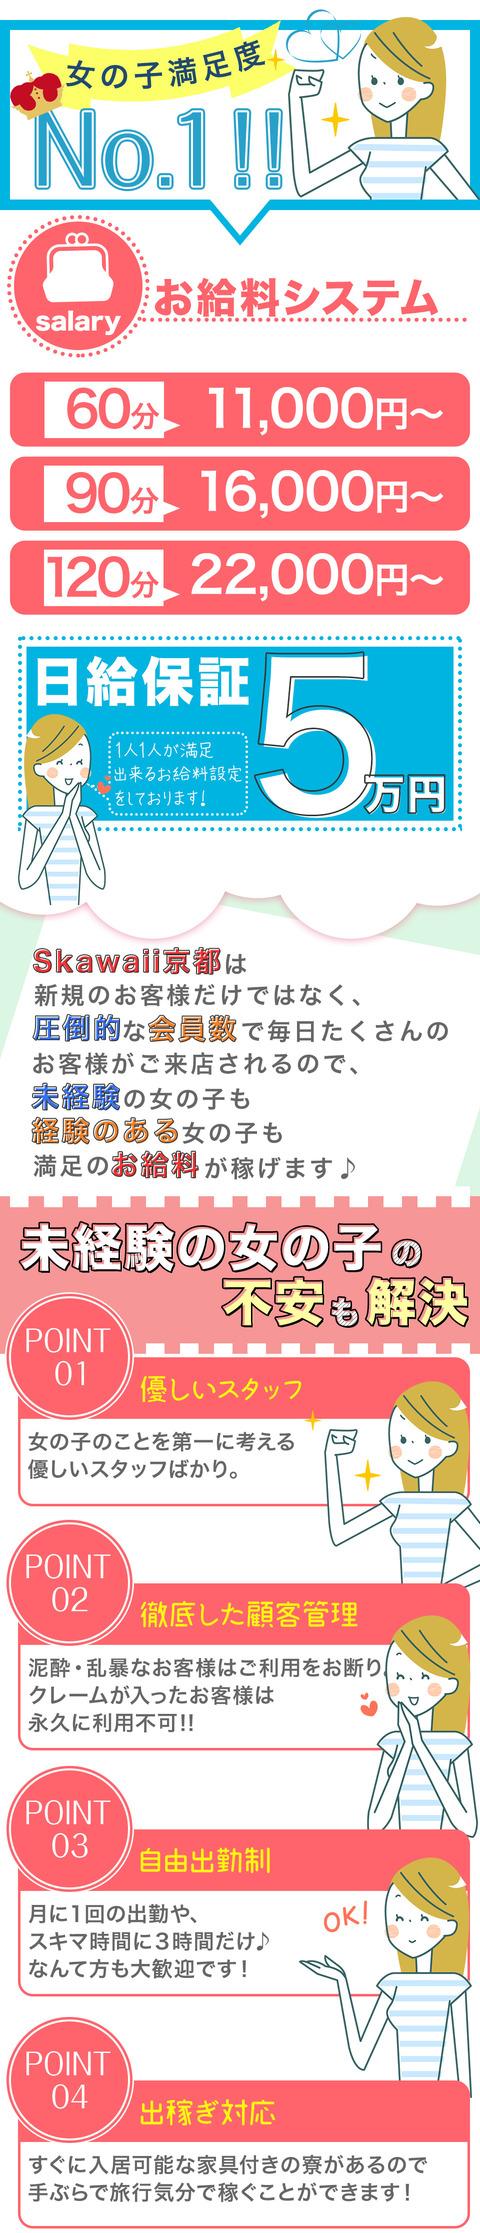 heaven-lp-sk-kyoto_01